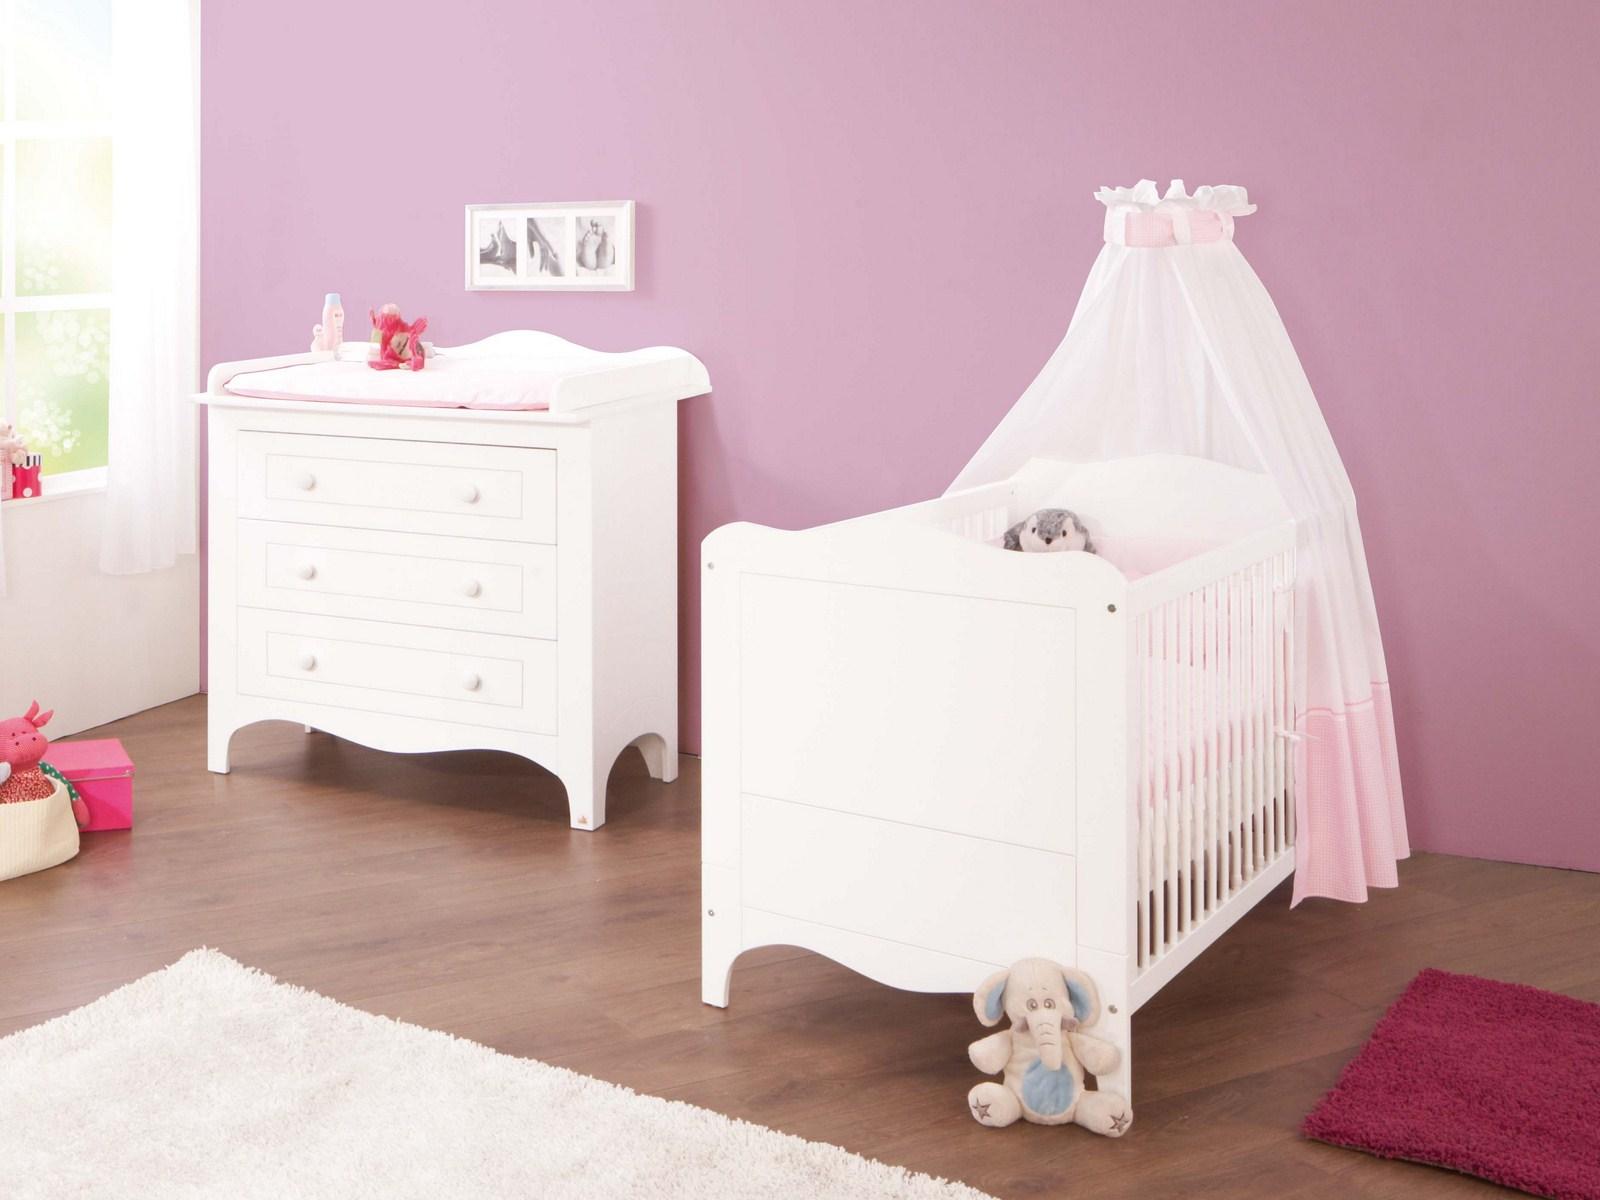 Pinolino Chambre bébé Polar blanc: Lit évolutif, commode à ...